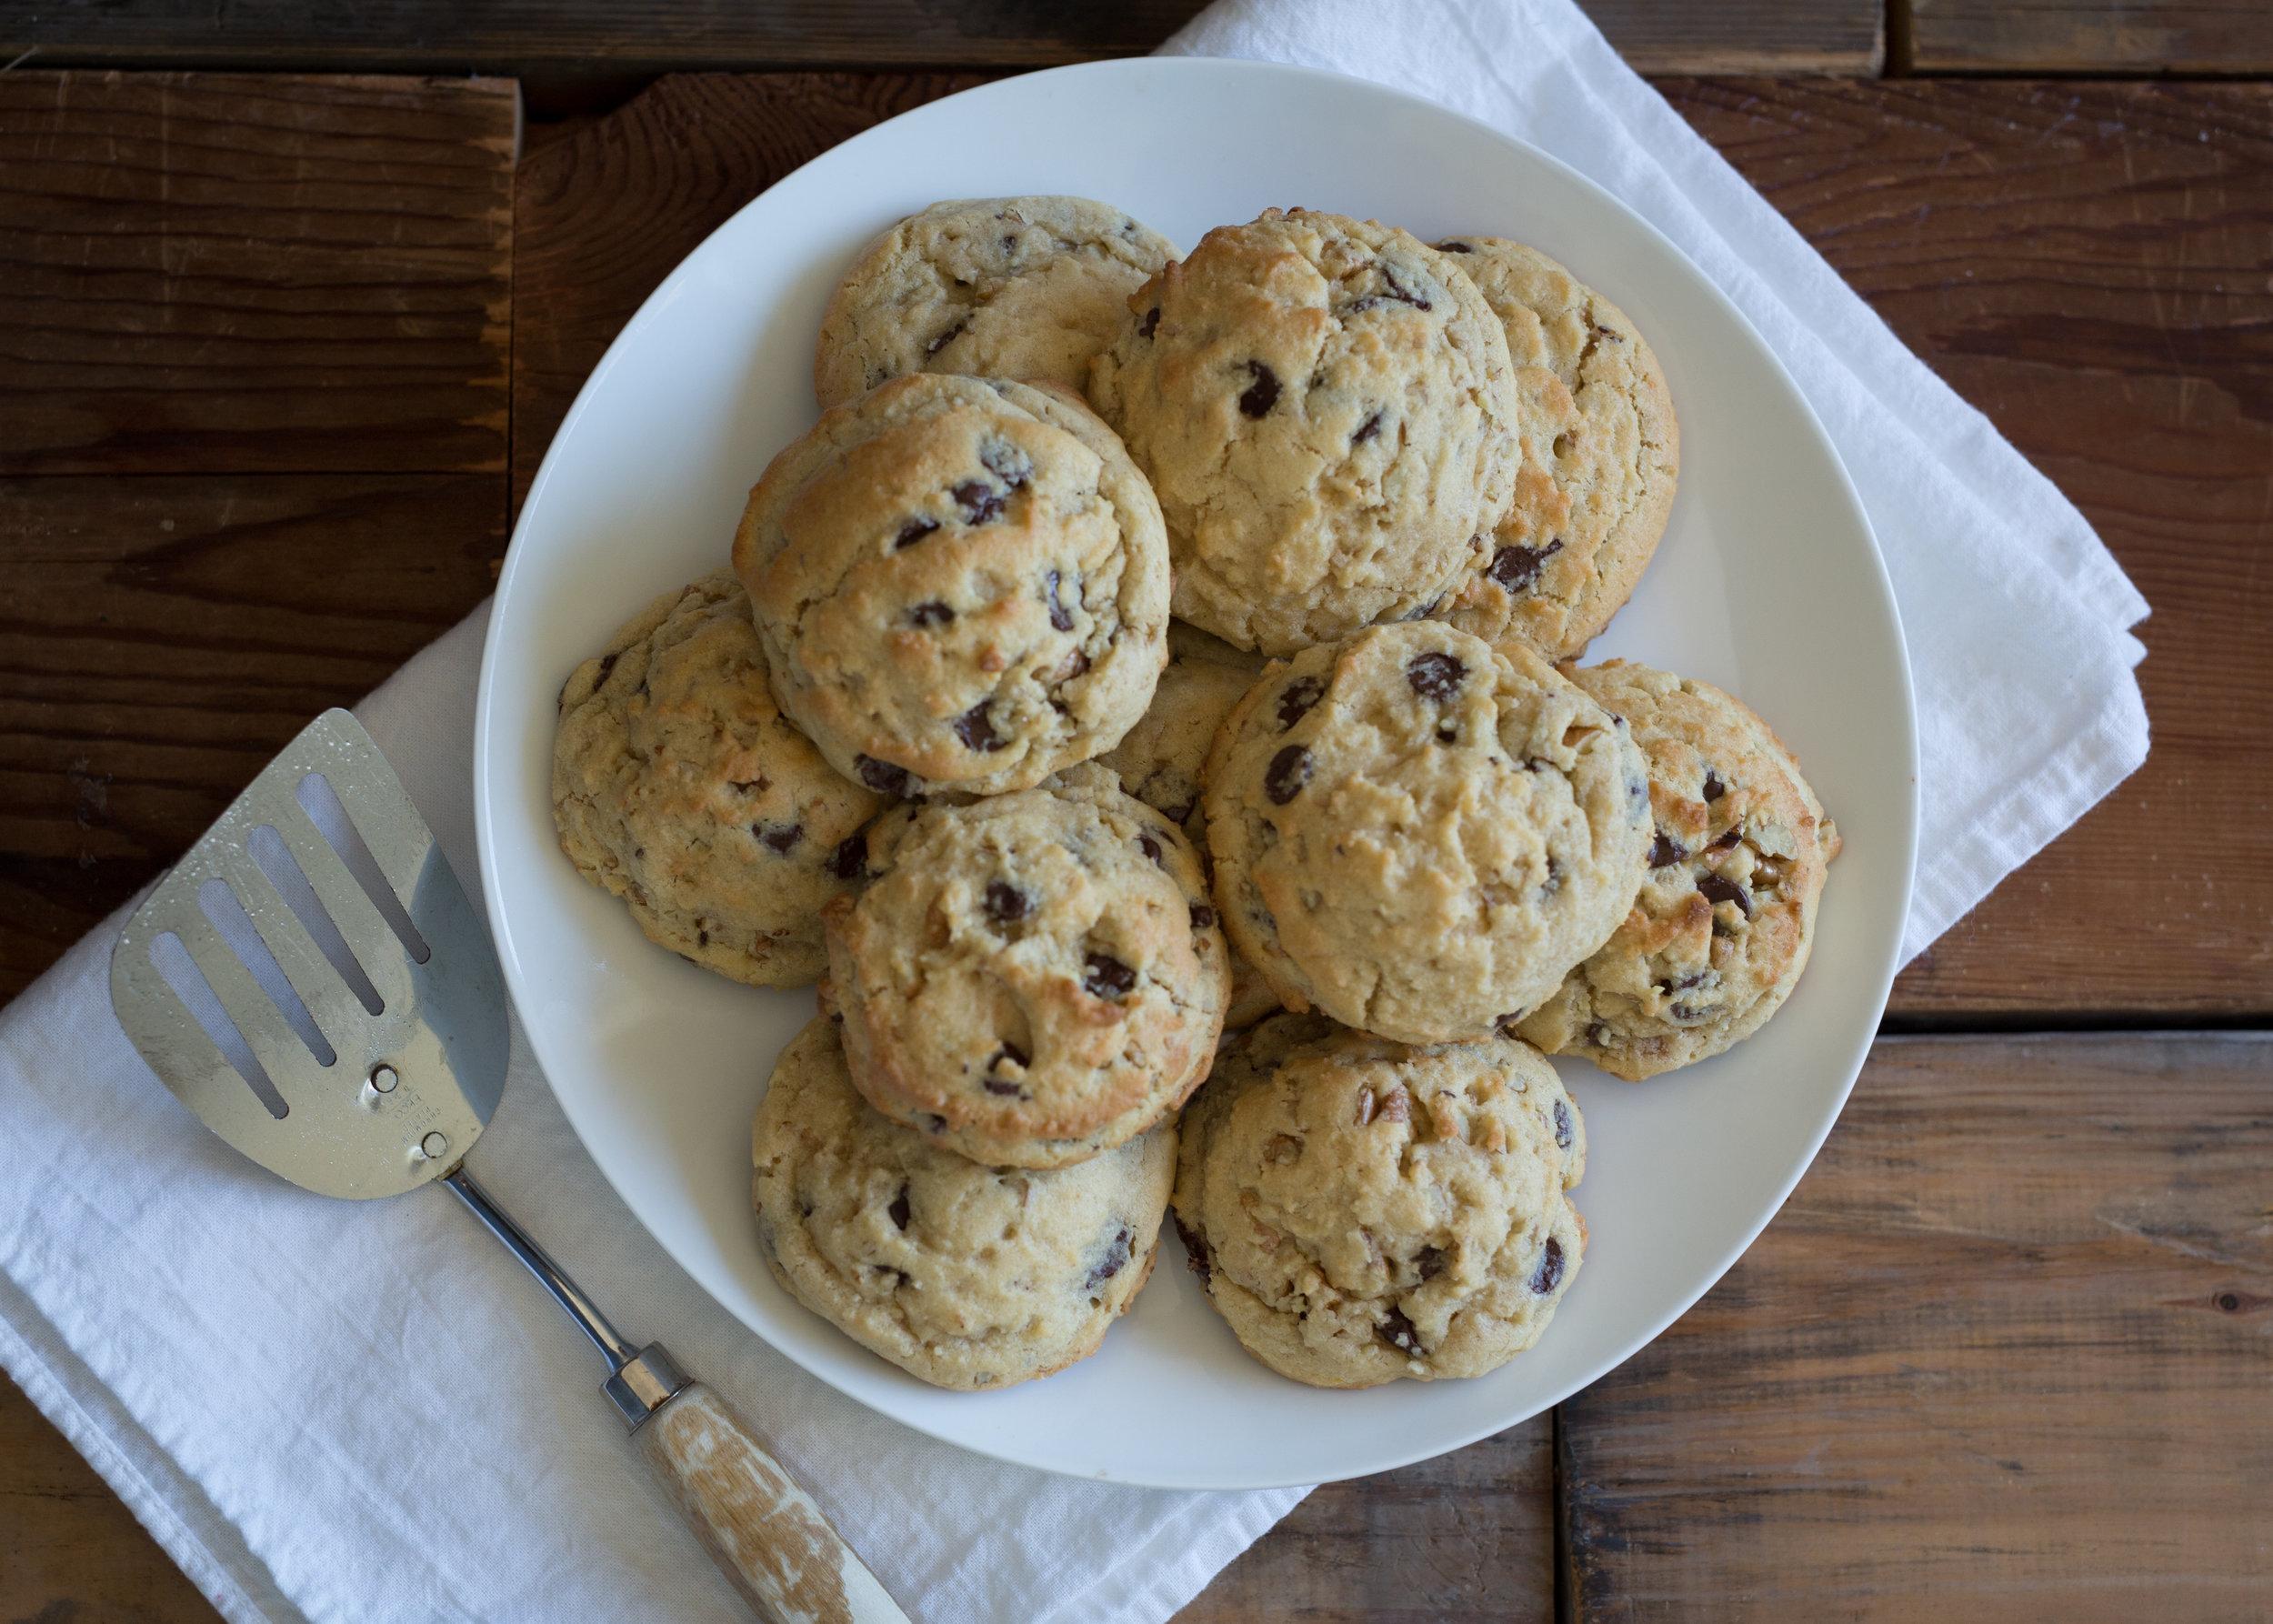 pecan-chocolate-chip-cookie-recipe-02.jpg